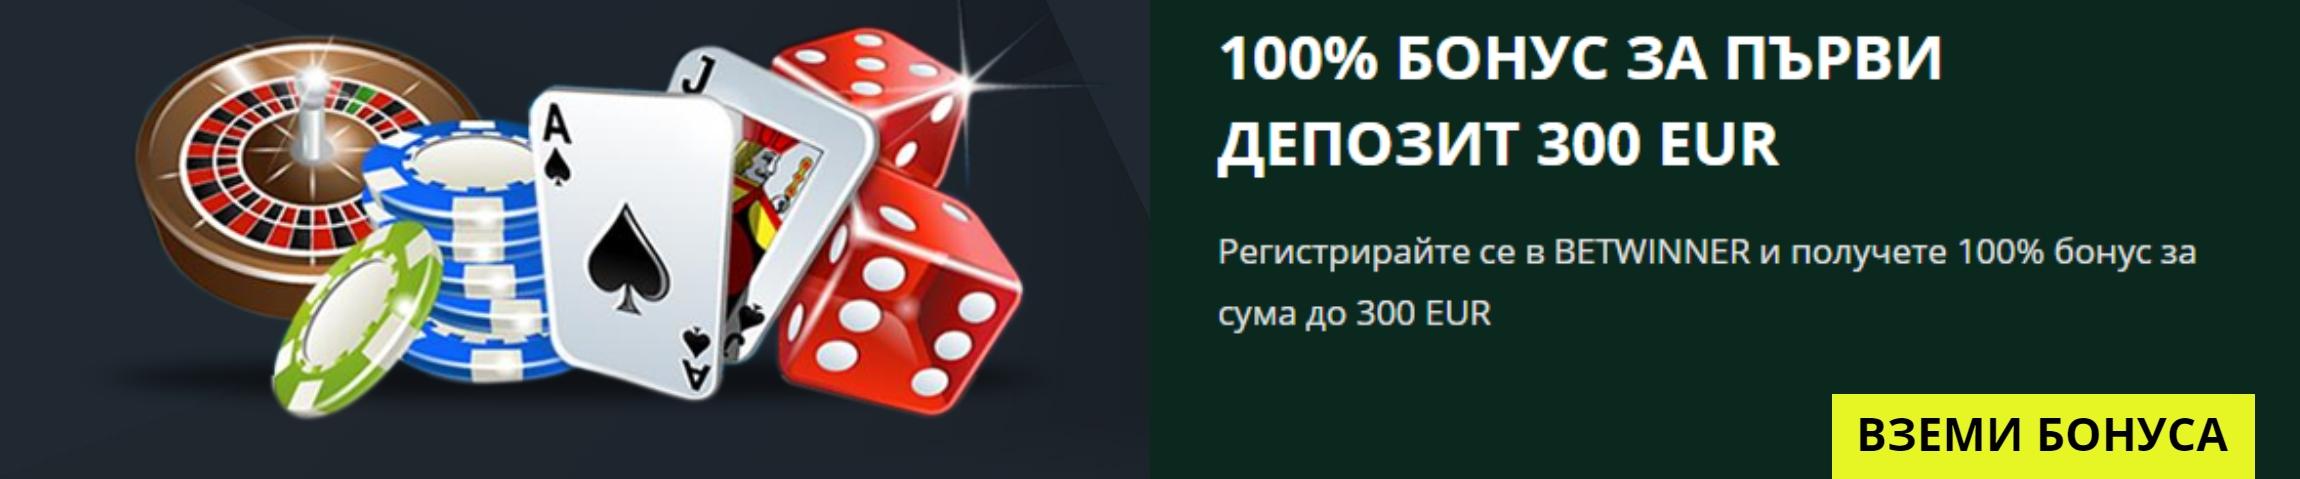 Betwinner казино бонус 600лв